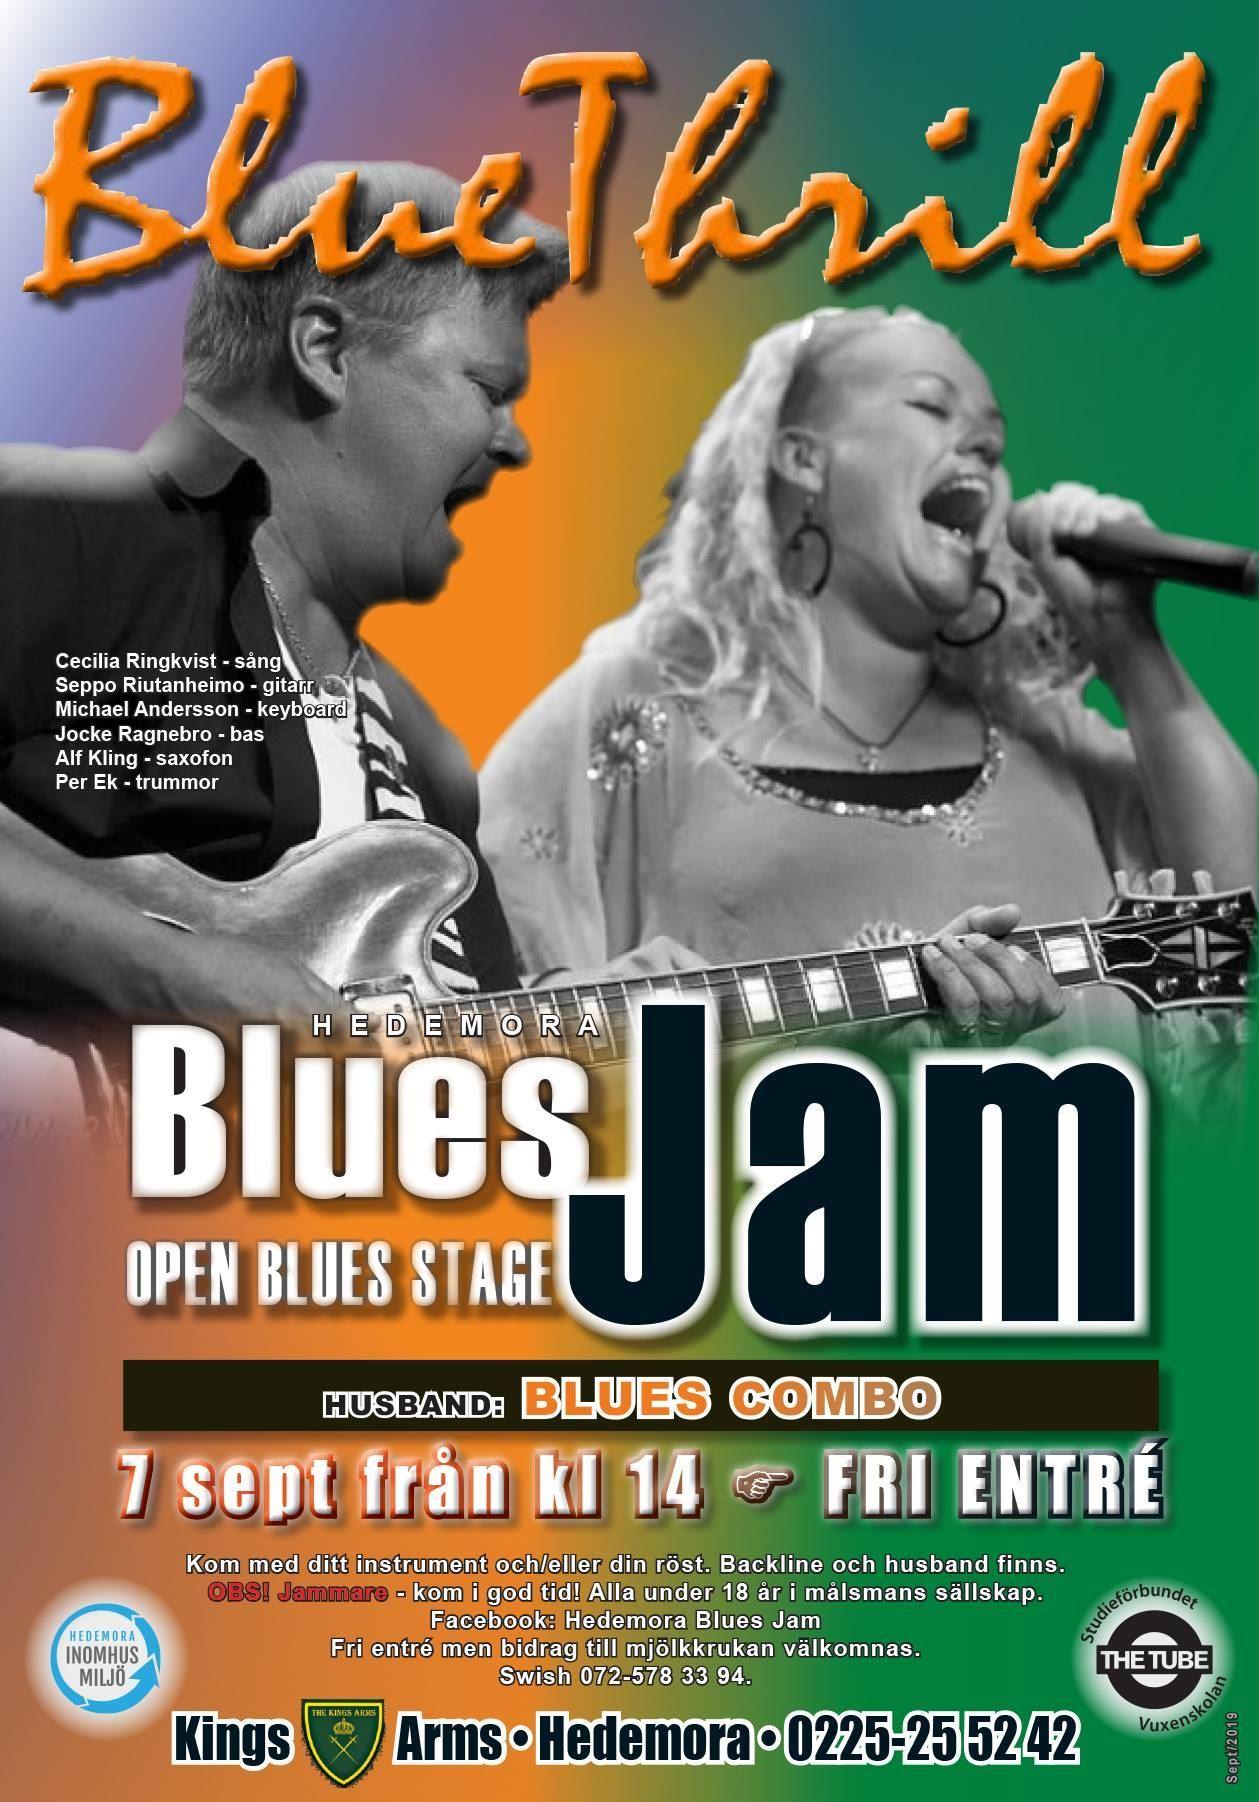 Hedemora Blues Jam + Blue Thrill